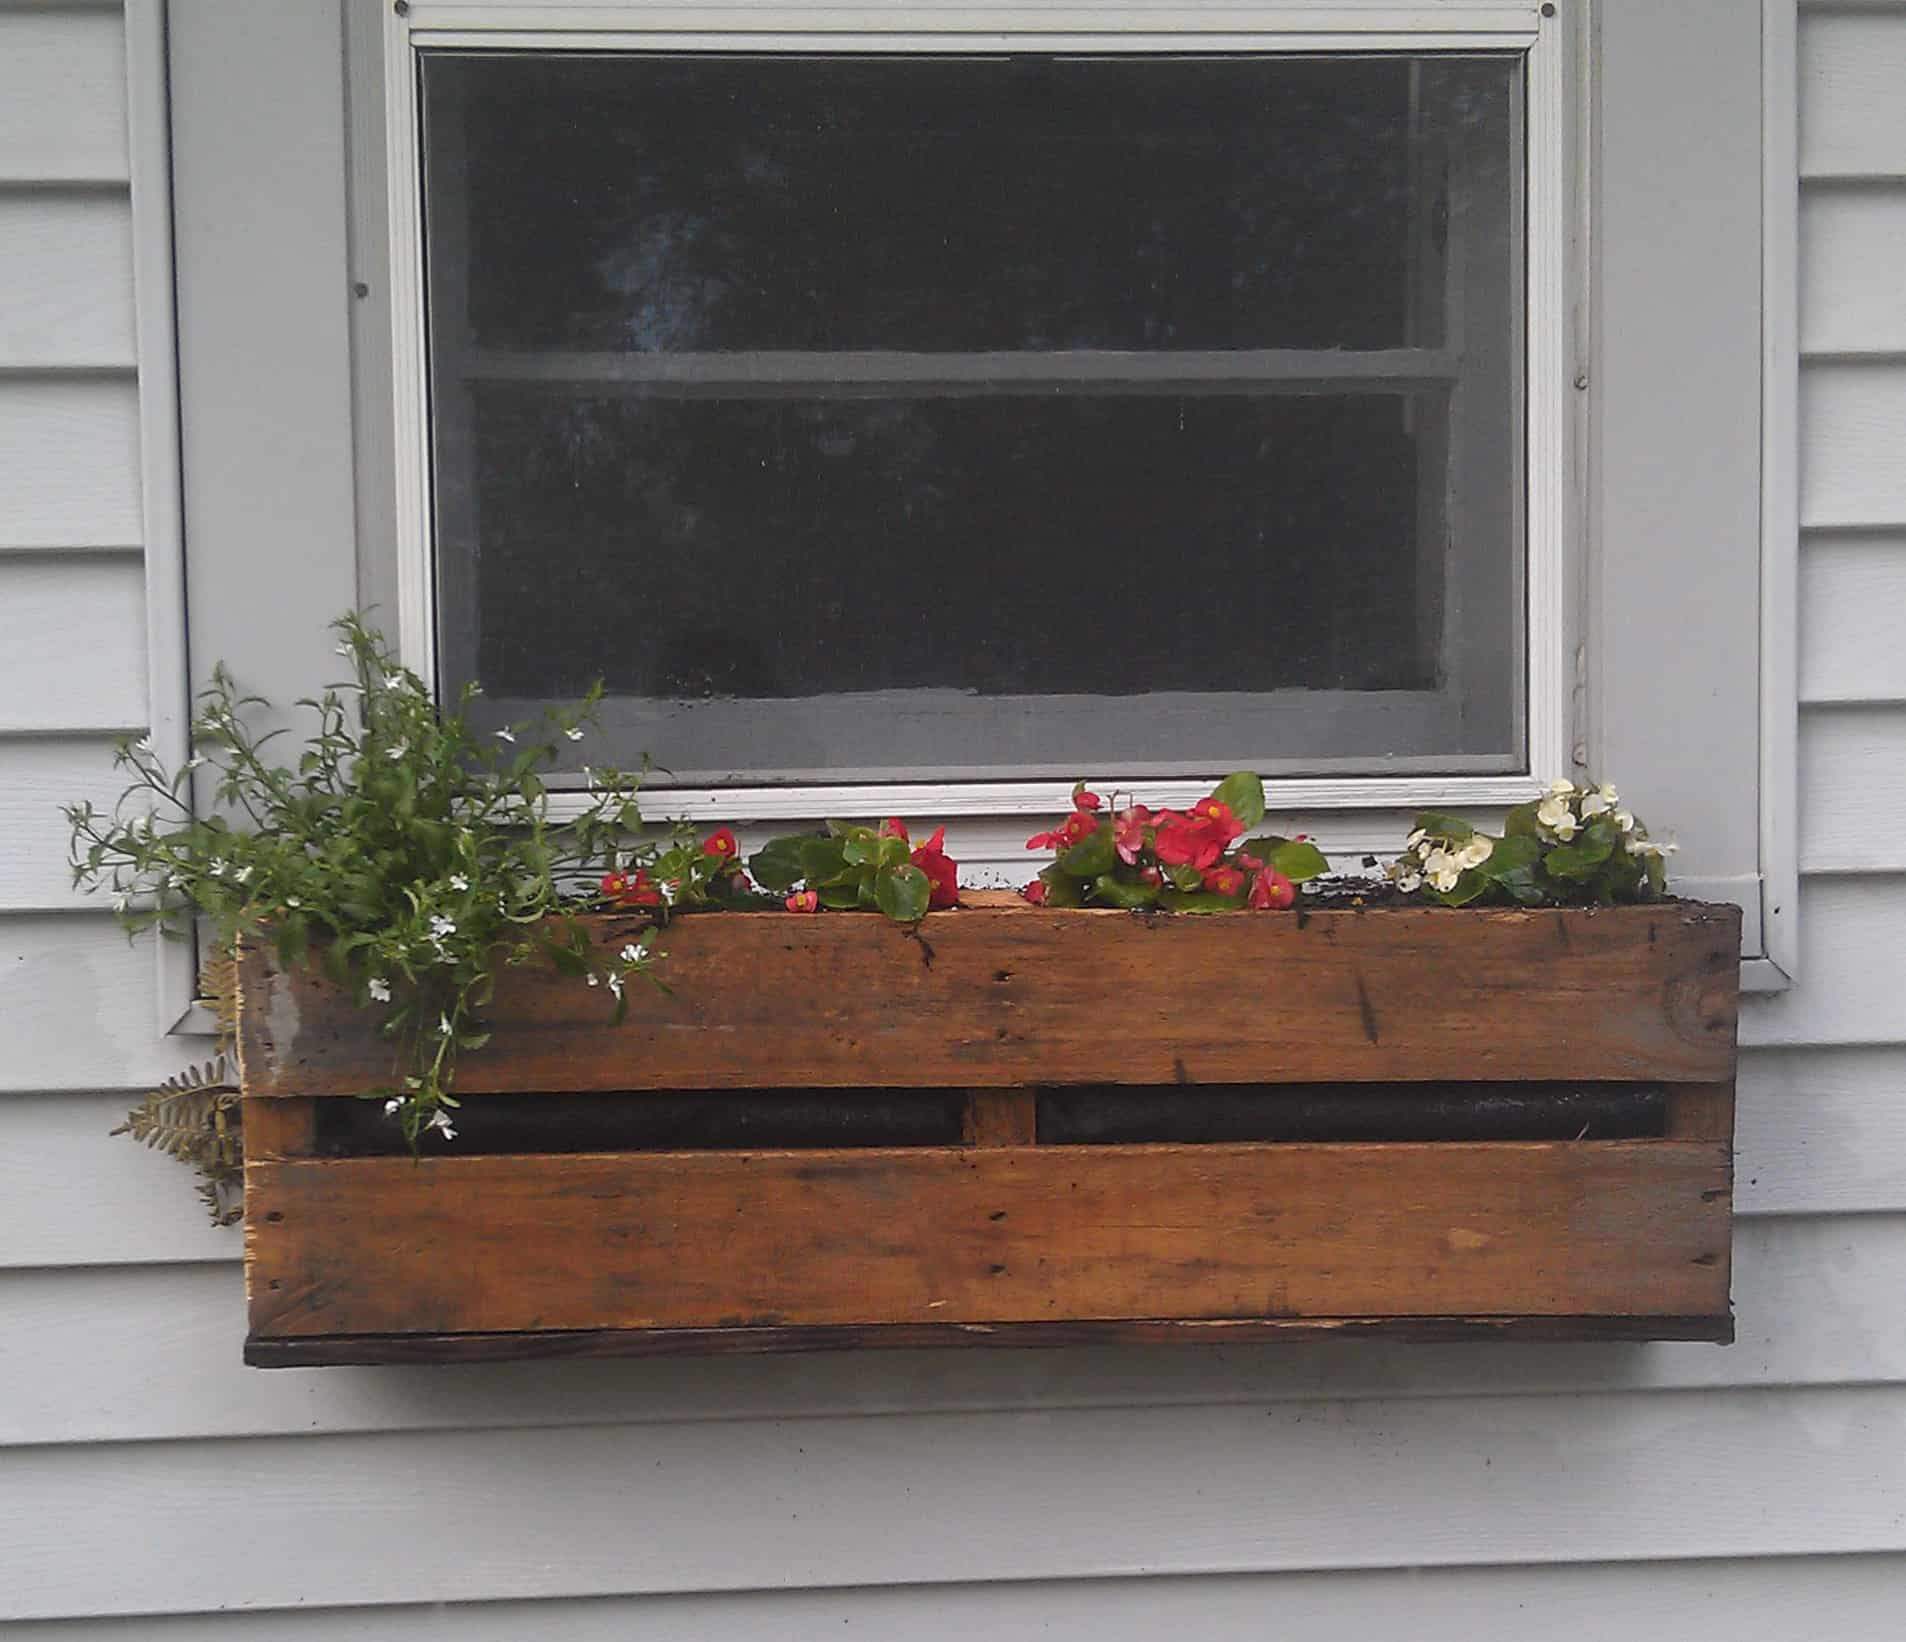 Wooden pallet window box